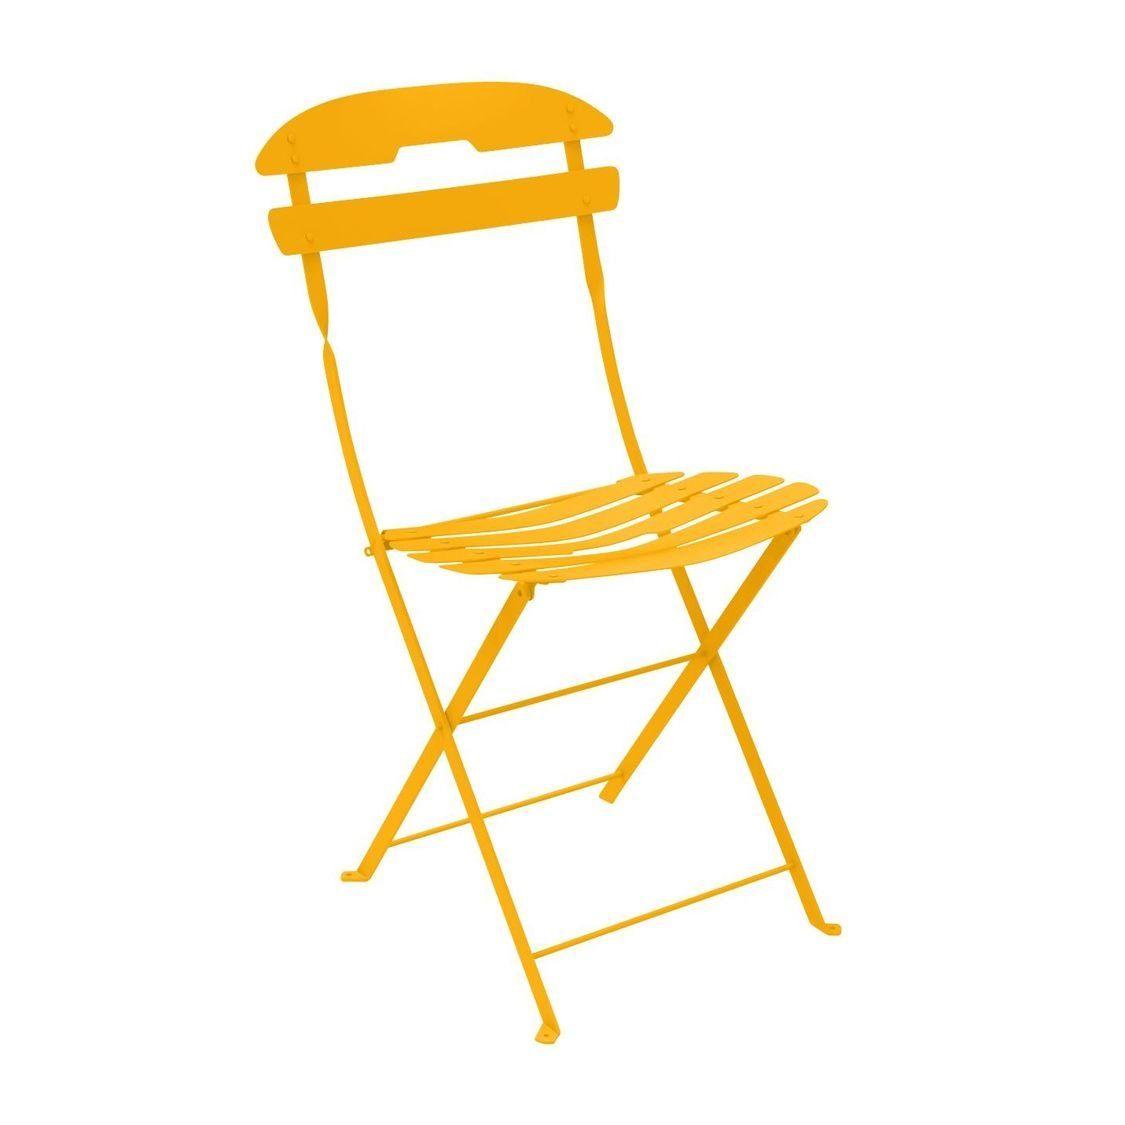 la mome garden chair folding chair fermob ambientedirect com